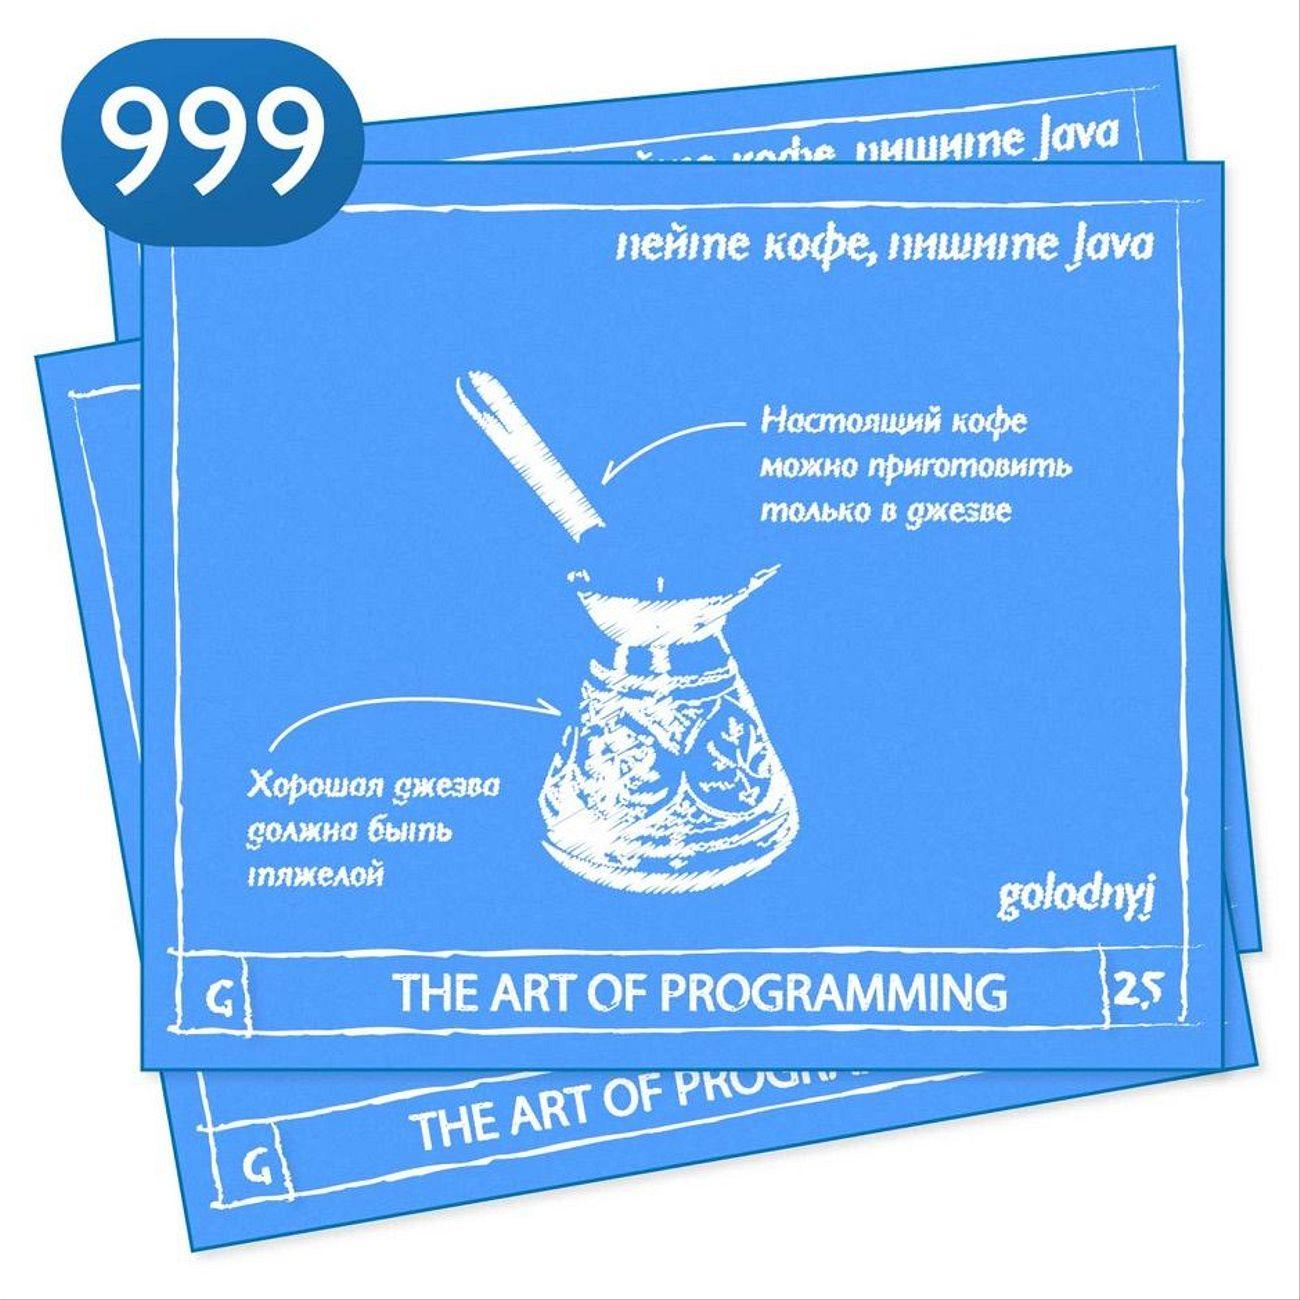 The Art of Programming